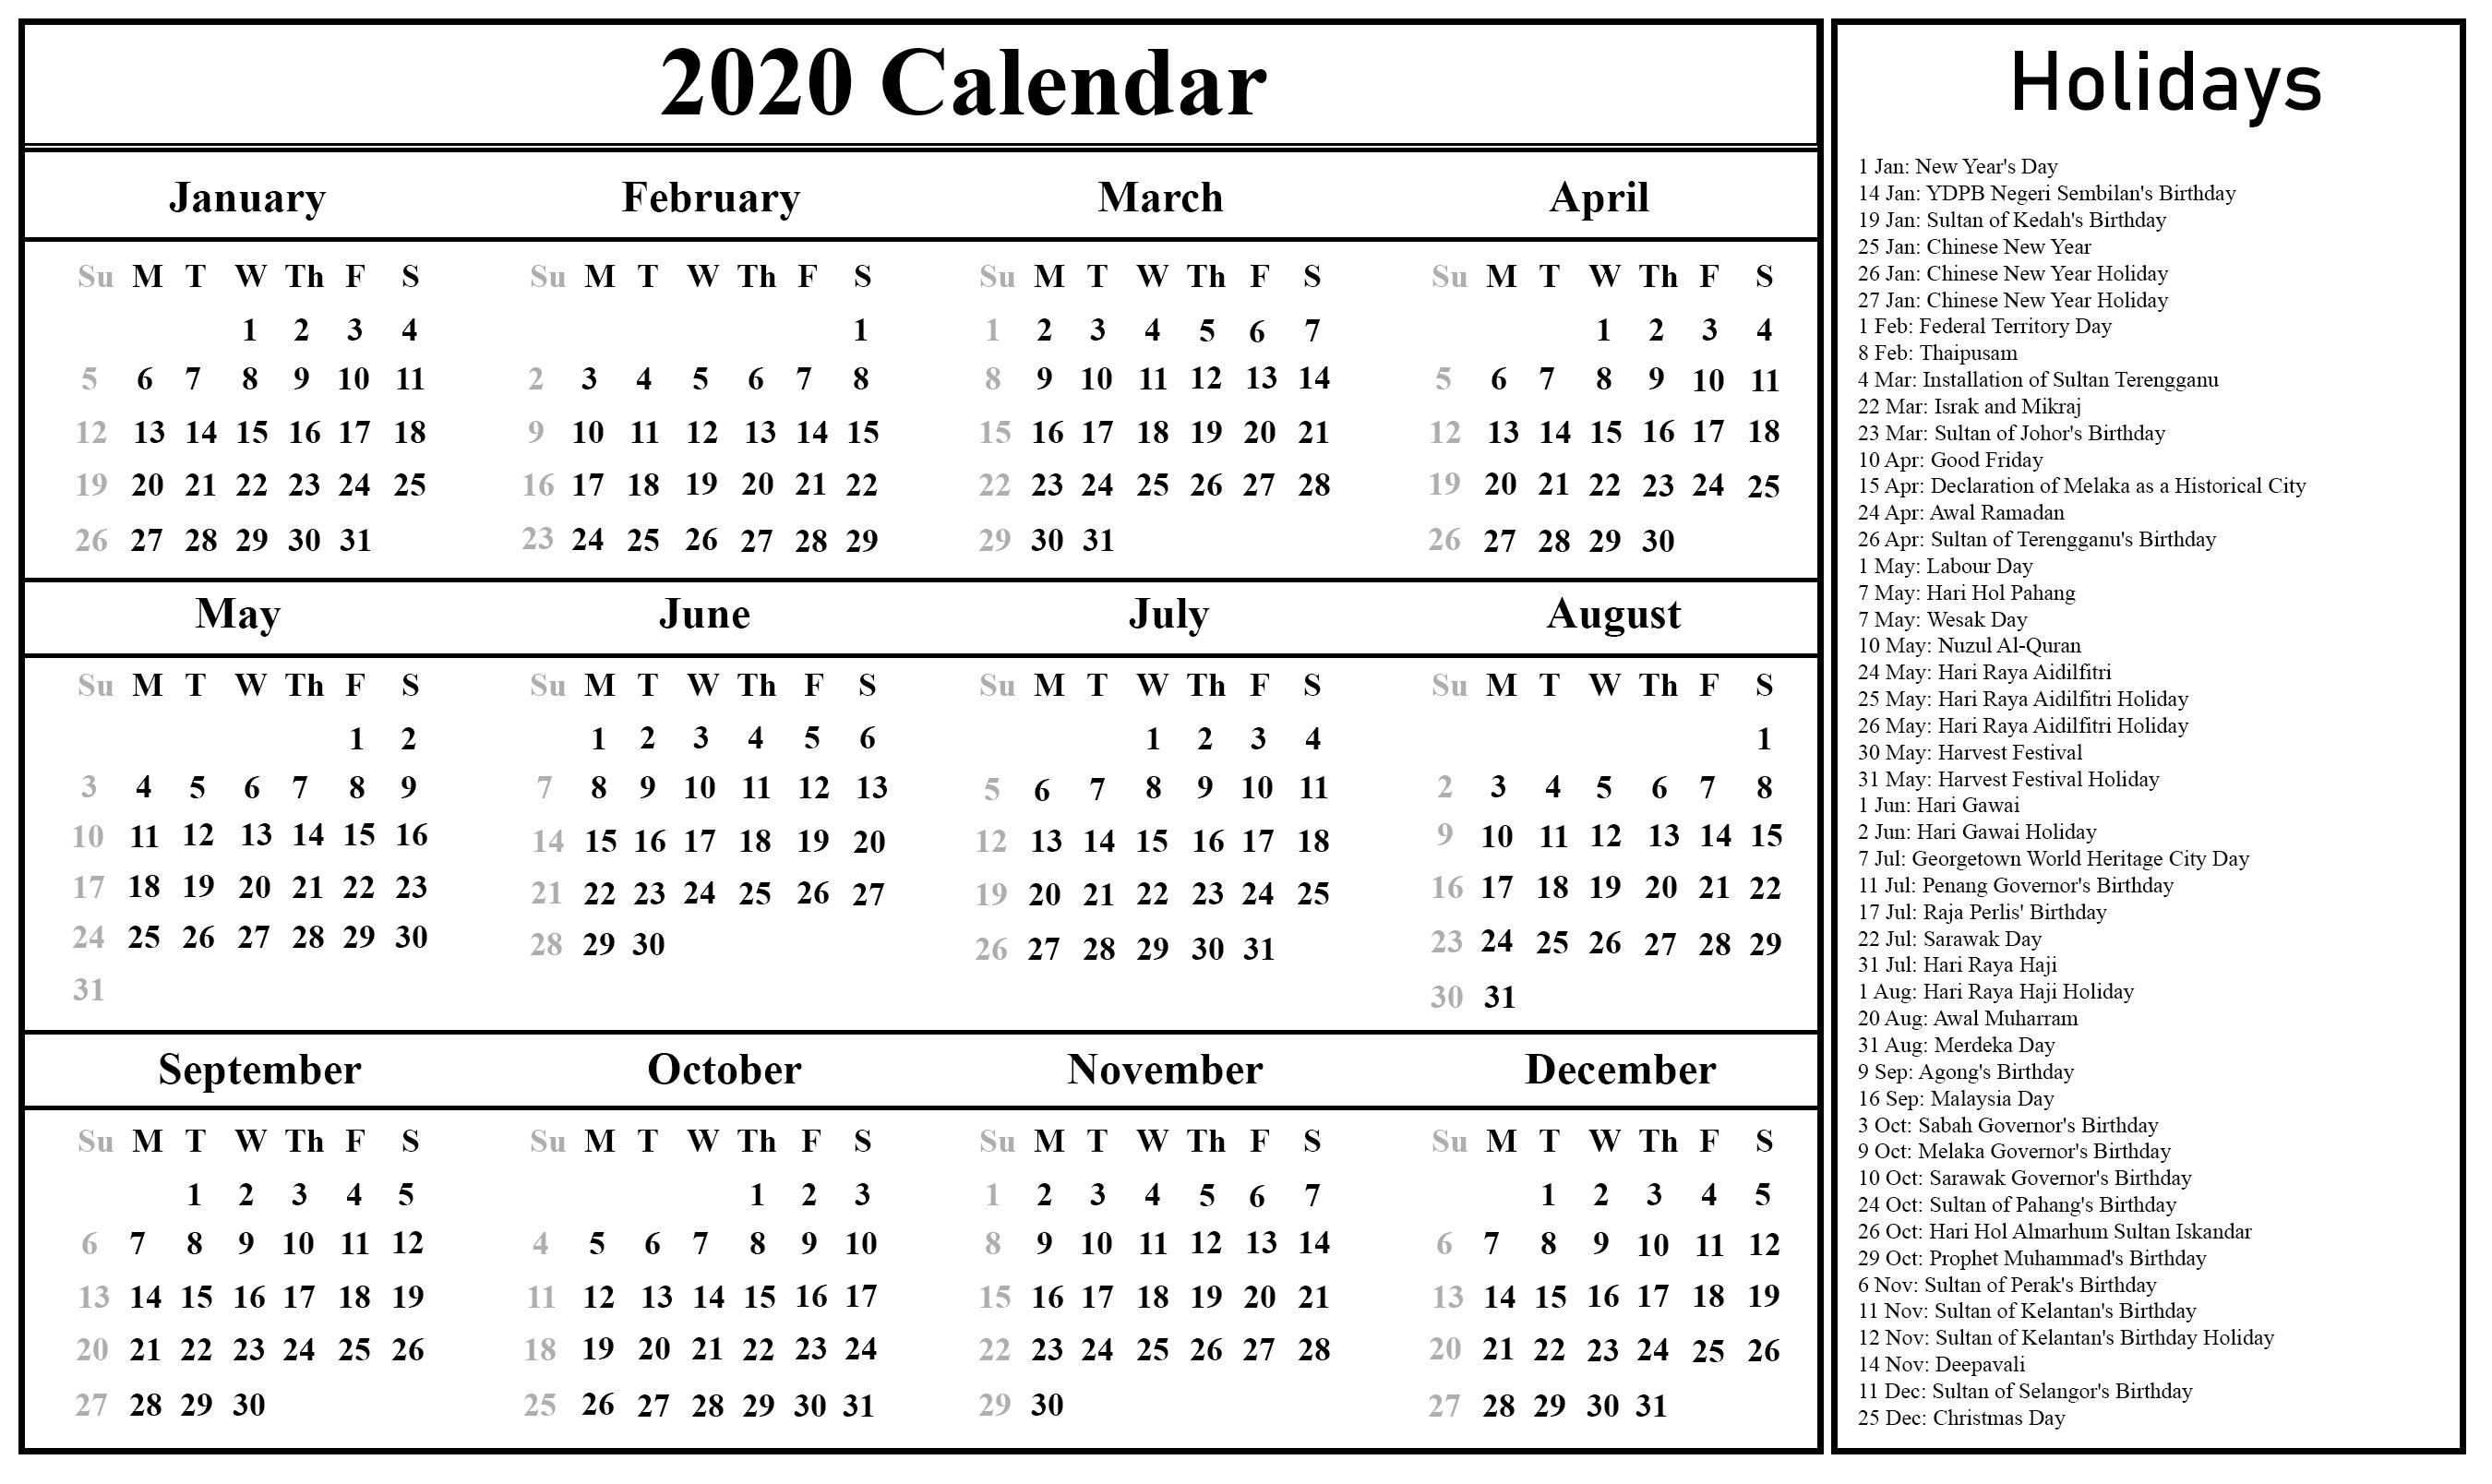 Free Printable Malaysia Calendar 2020 In Pdf, Excel & Word regarding Malaysia Kuda Calendar 2020